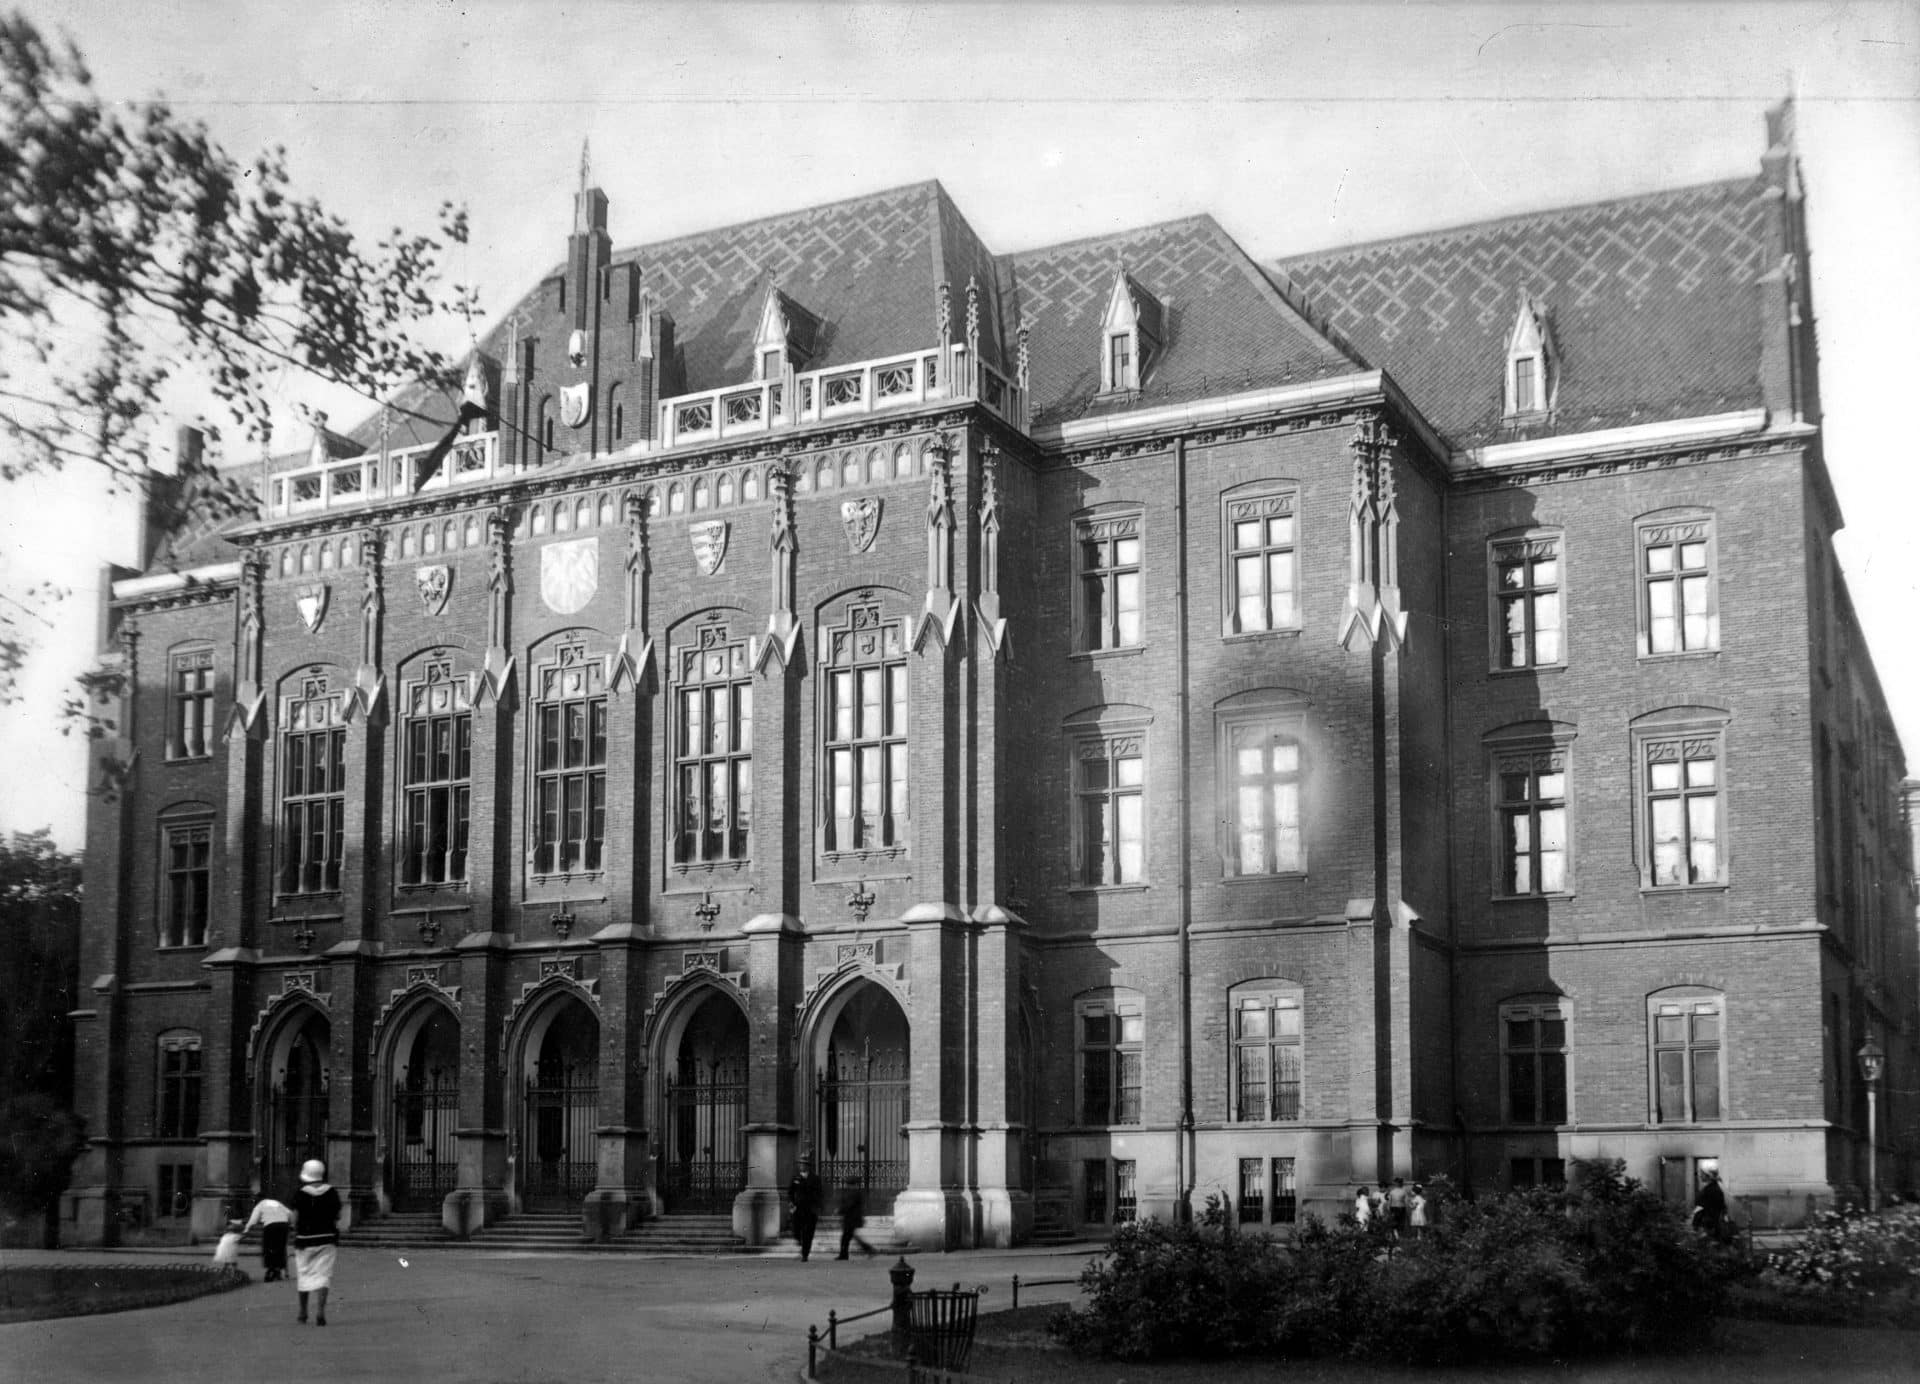 Collegium Novum w 1927 roku. Uniwersytet Jagielloński. Fot. NAC.